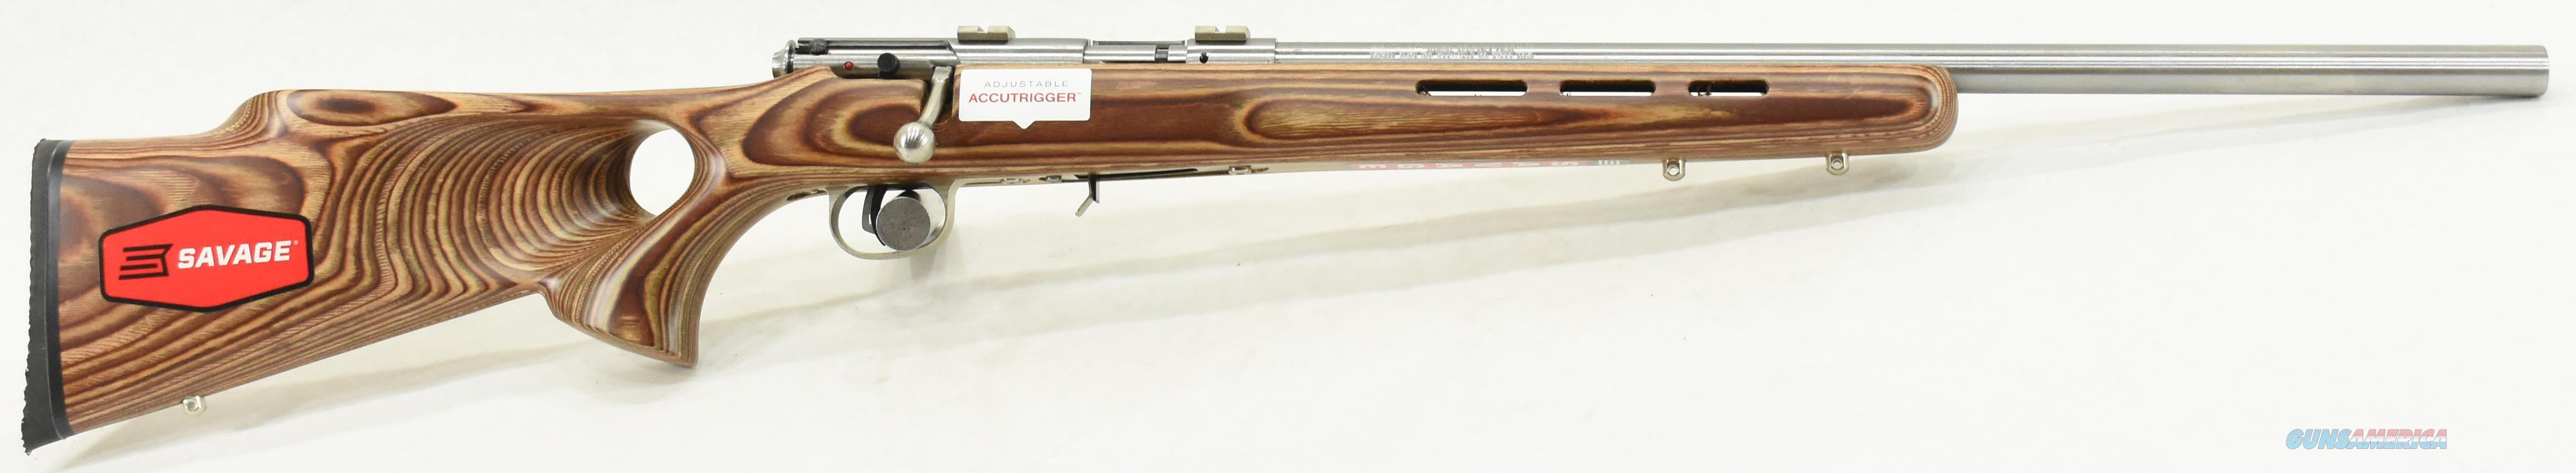 93 BTVS Lam Thumbhole SS 17 HMR 21In  96200  Guns > Rifles > Savage Rifles > Accutrigger Models > Sporting